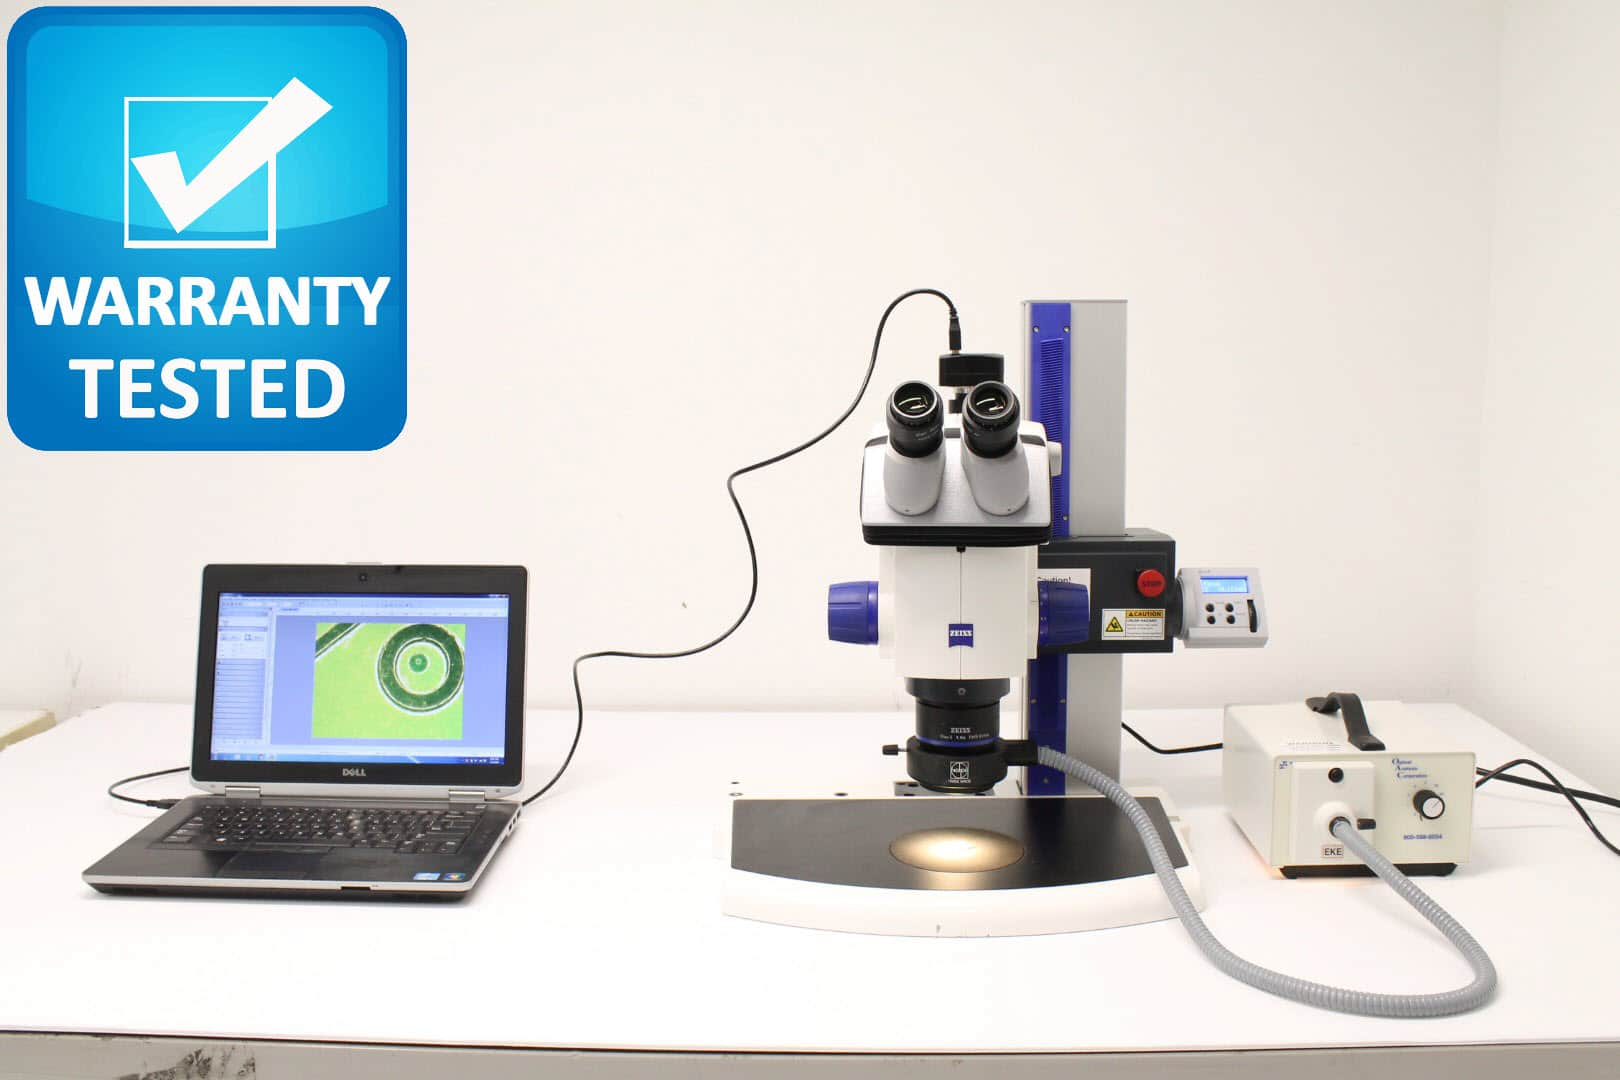 Zeiss Discovery.V8 Stereo Microscope Stereoscope has Motorized Z